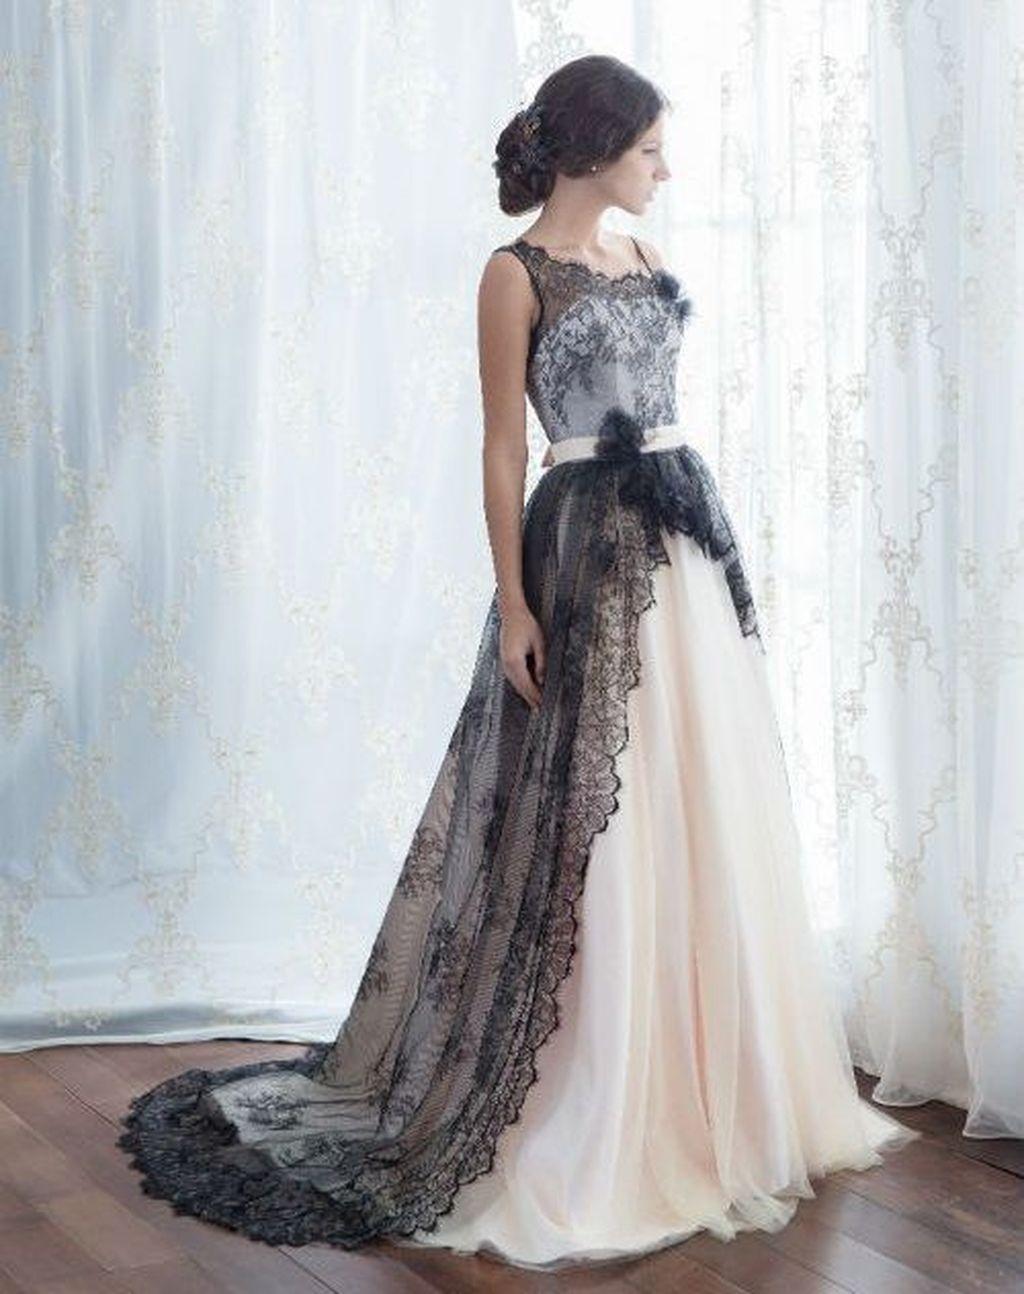 stunning halloween wedding dress ideas you will love to try